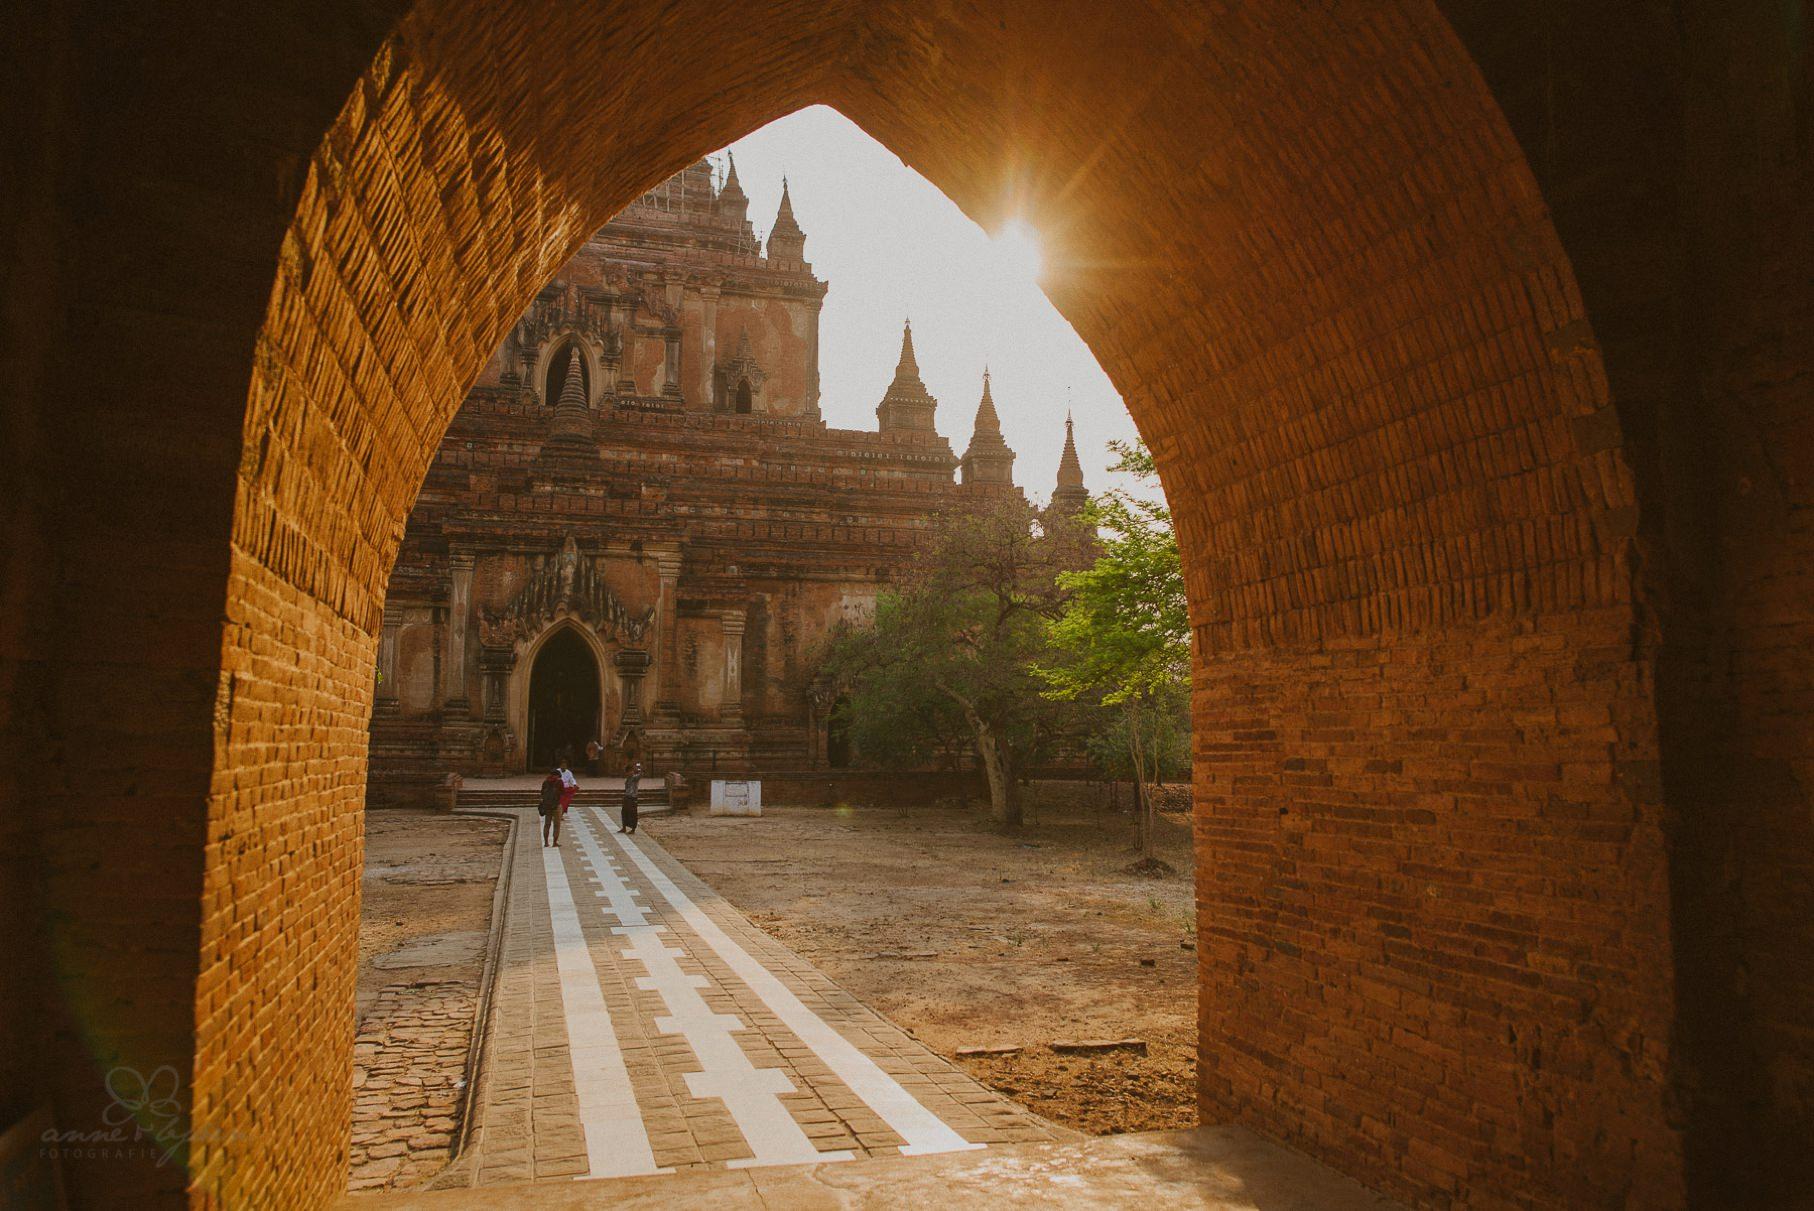 0014 bagan ngwesaung d76 7759 1 - Tempelstadt Bagan & tauchen am Ngwesaungbeach